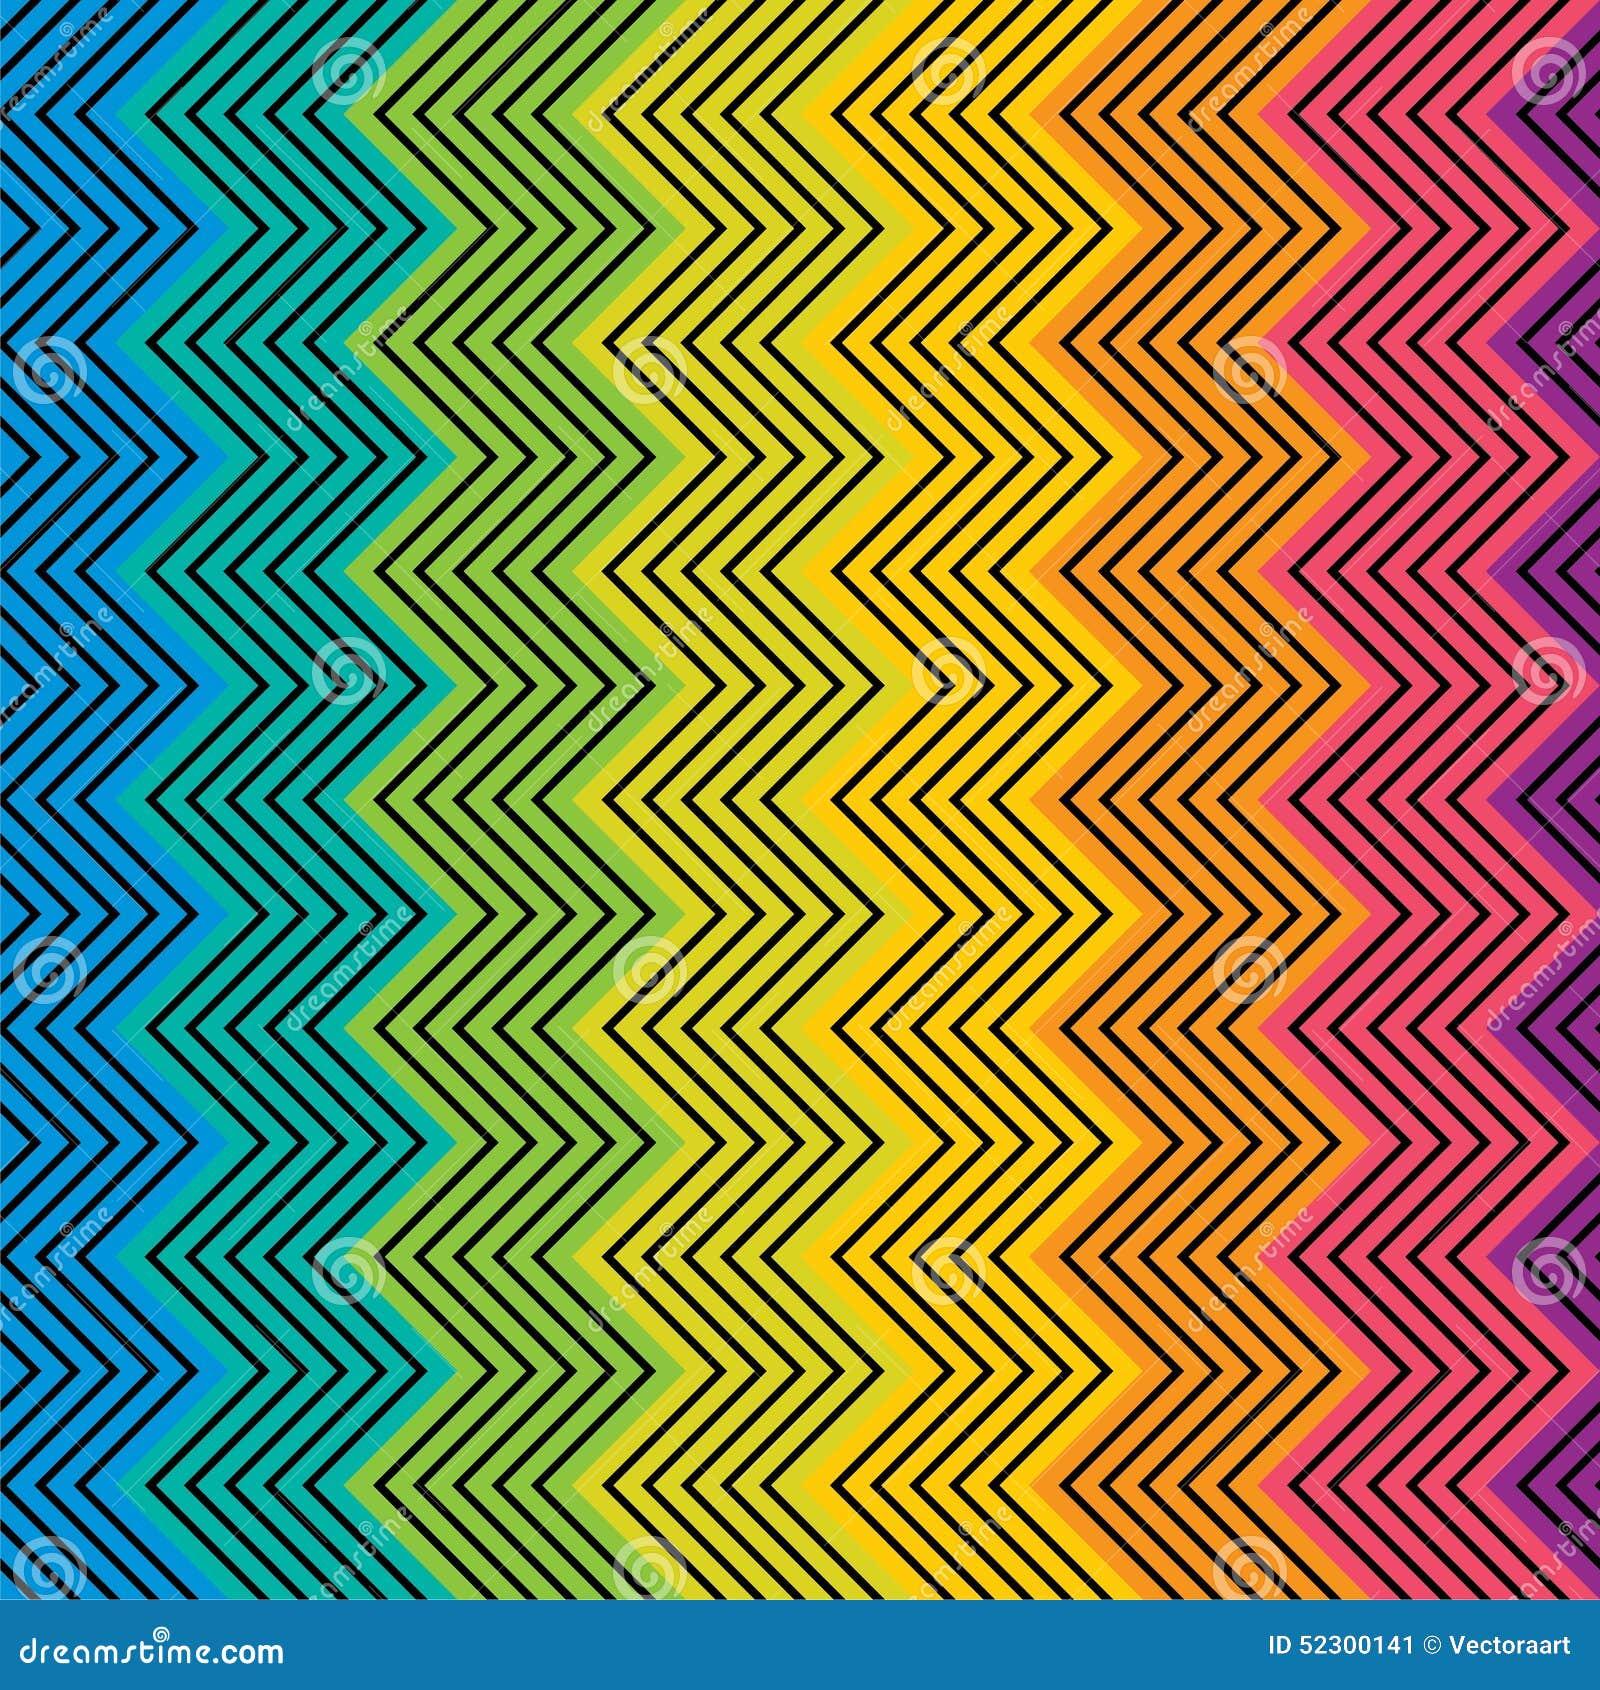 creative colorful zig zag design pattern stock vector image 52300141. Black Bedroom Furniture Sets. Home Design Ideas